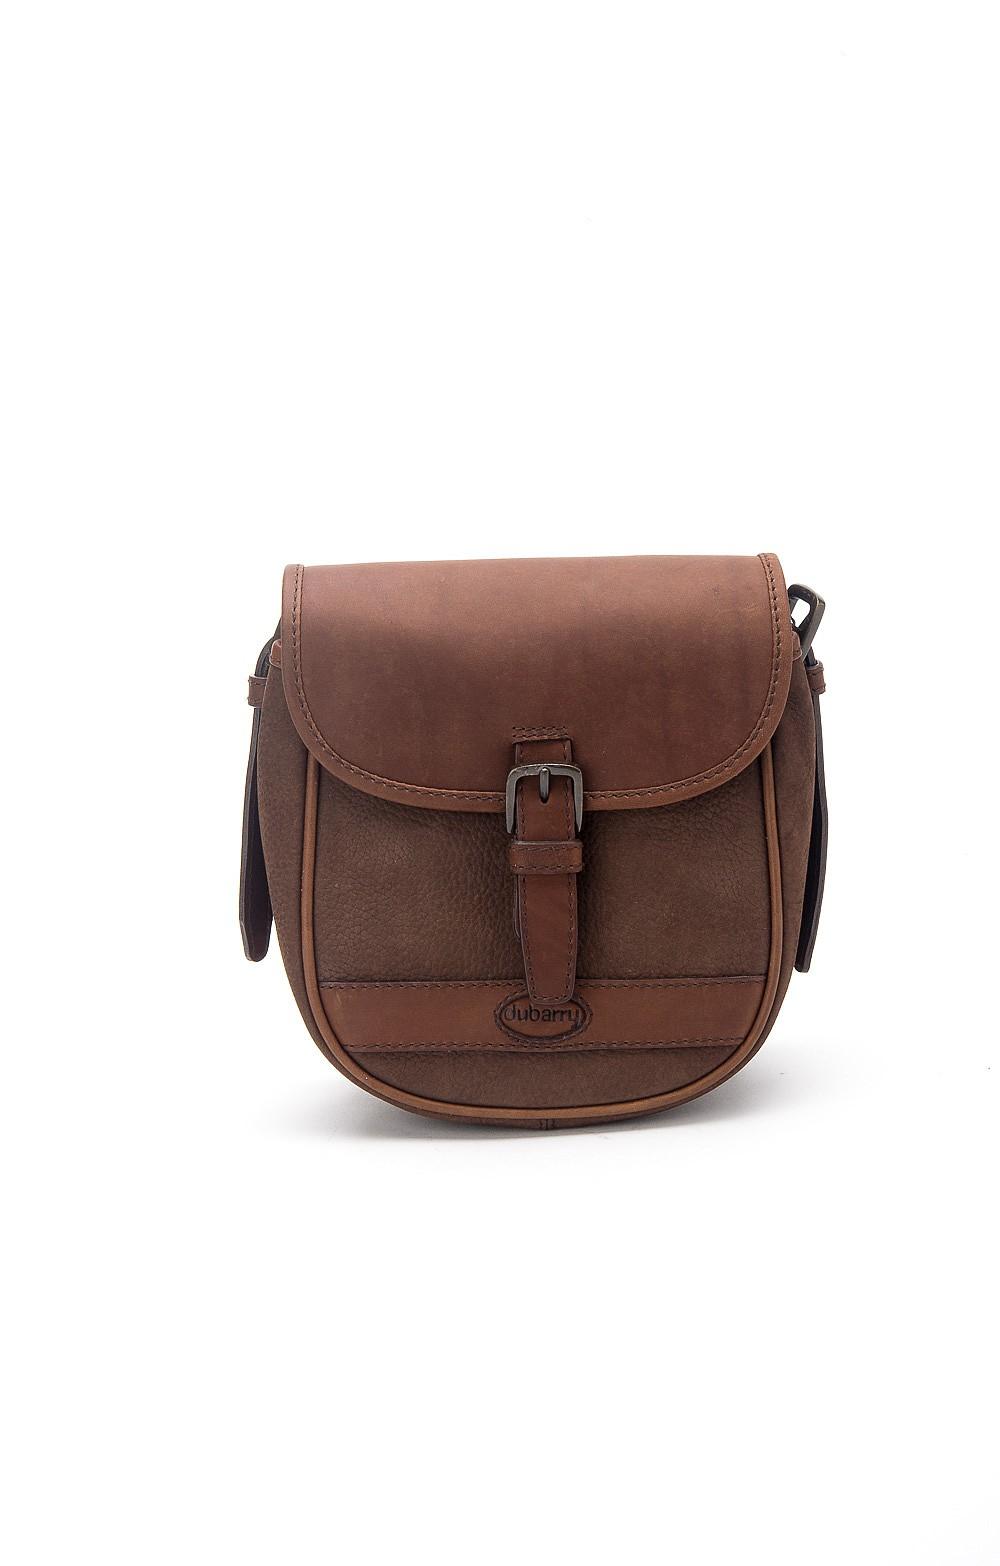 Dubarry Ballymena Crossbody Bag